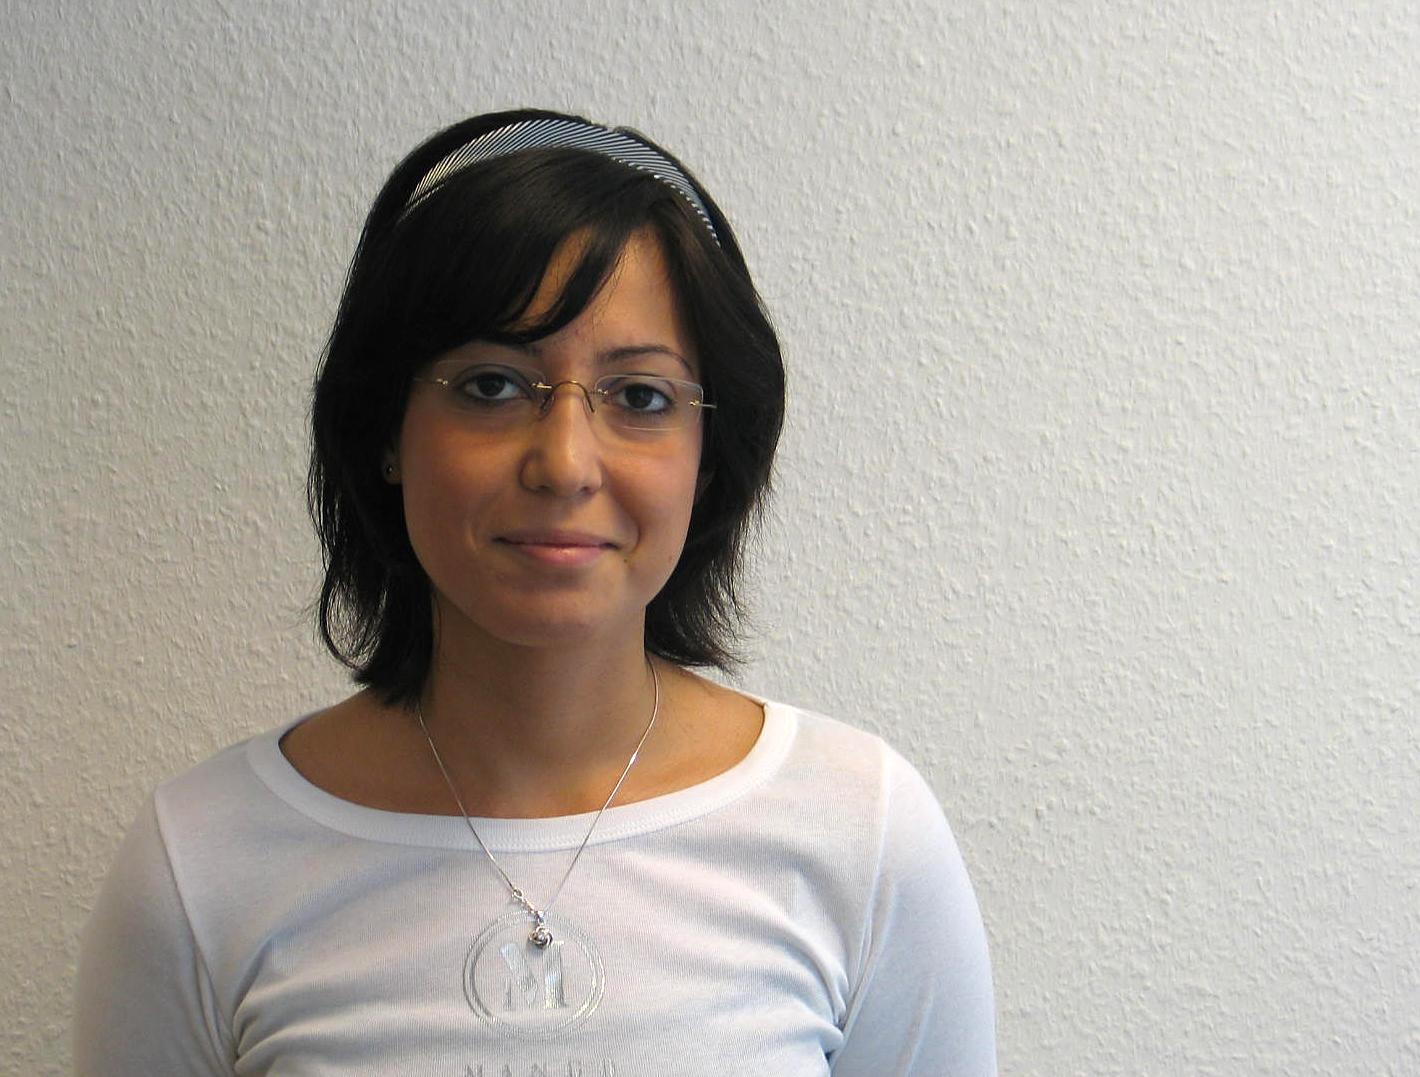 Preisträgerin Yasemin Yadigaroglu